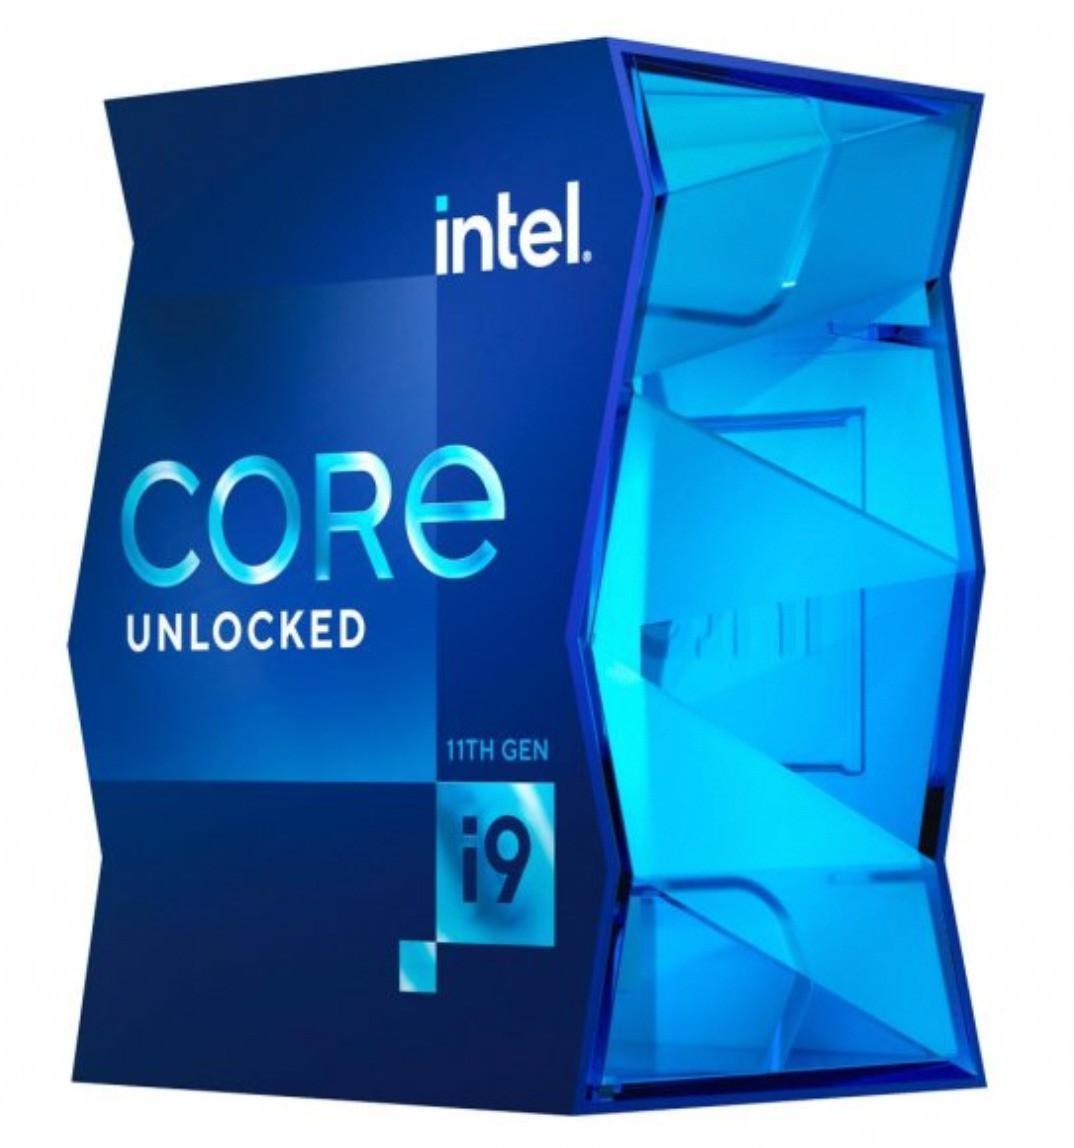 Процессор Intel Core i9-11900K 3.5GHz/16MB (BX8070811900K) s1200 BOX